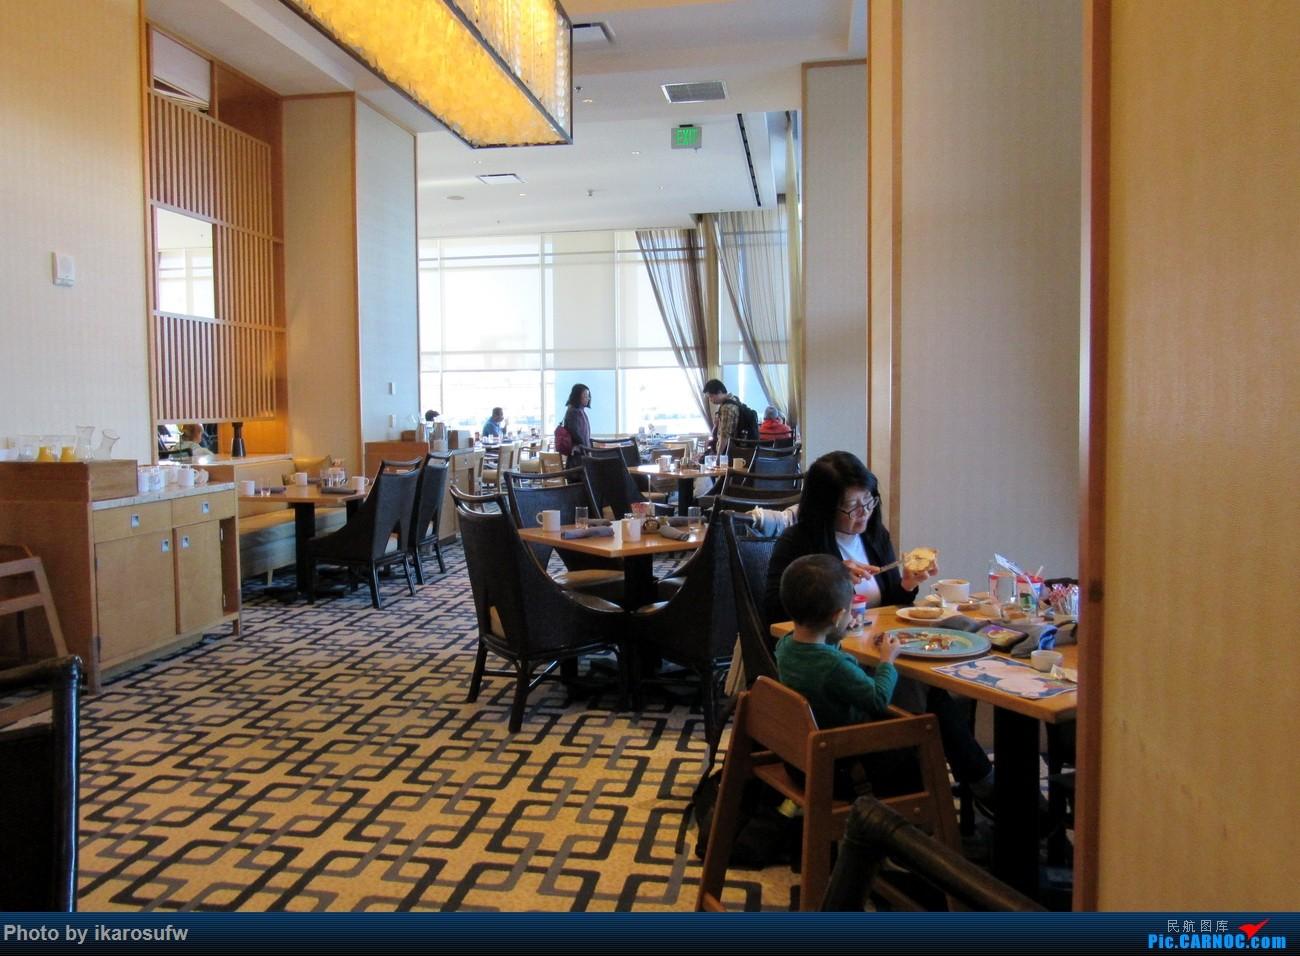 Re:[原创]这次是6+12小时 圣诞节新年 新加坡北京旧金山/洛杉矶北京新加坡往返全记录及美西20日之旅 中国国际航空 CA970/985/988/975(三)